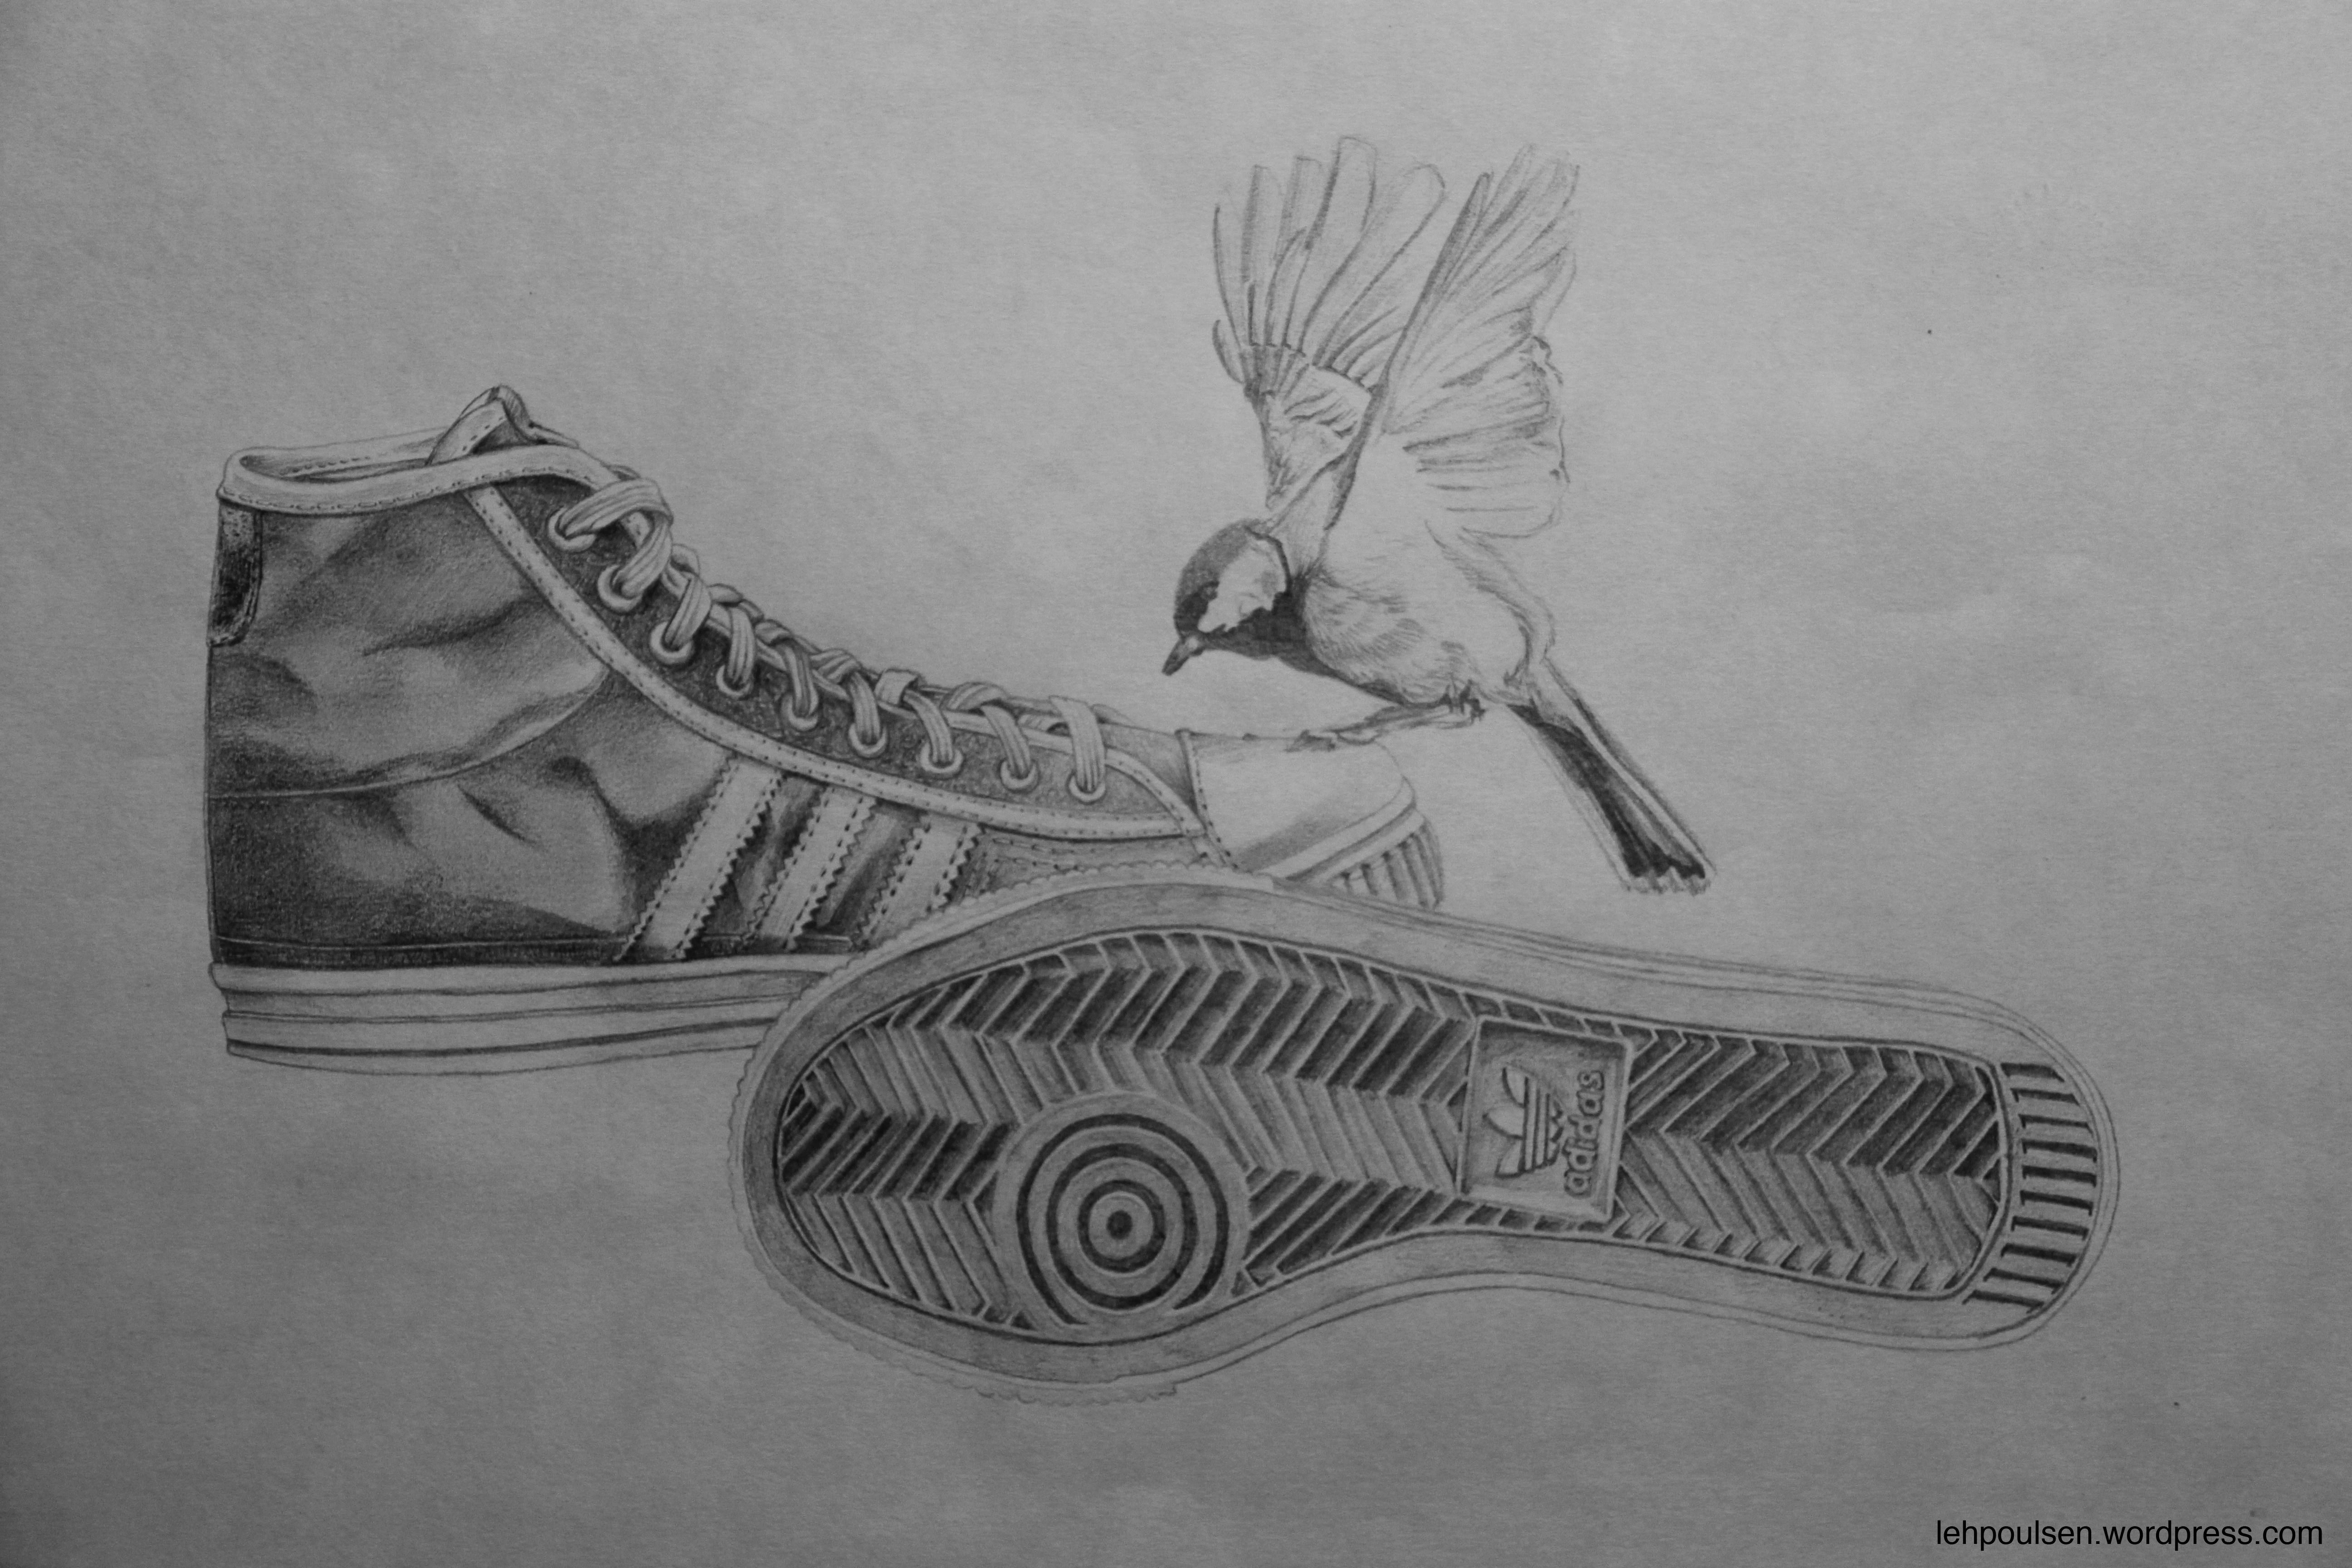 Drawn converse adidas shoe Illustration shoe Poulsen sneakers sneakers